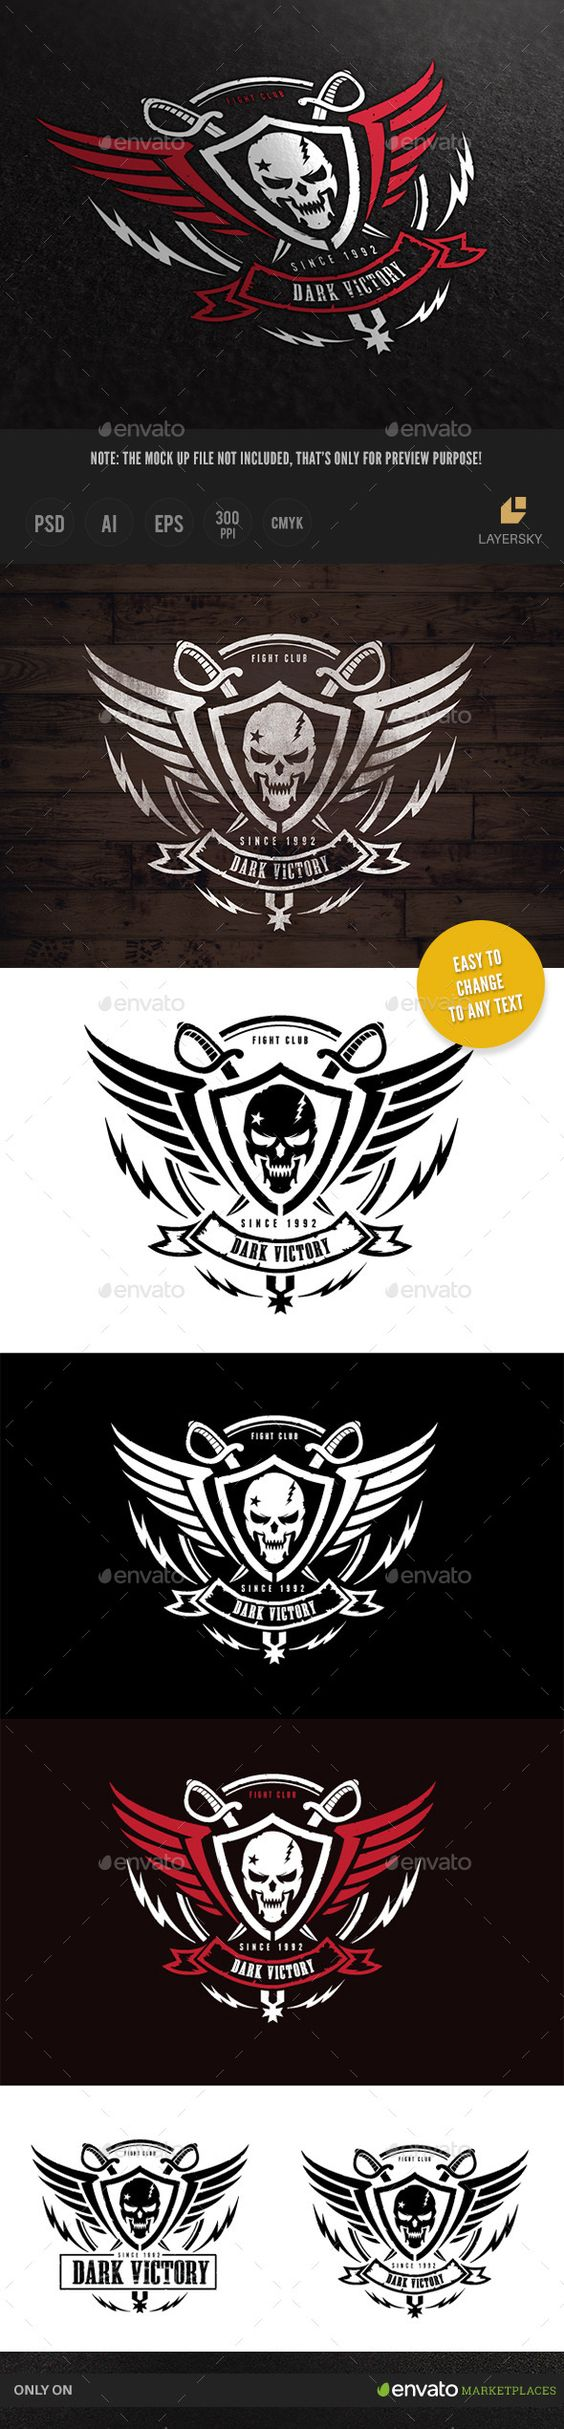 Dark Victory Logo Template #design Download: http://graphicriver.net/item/dark-victory/10053194?ref=ksioks